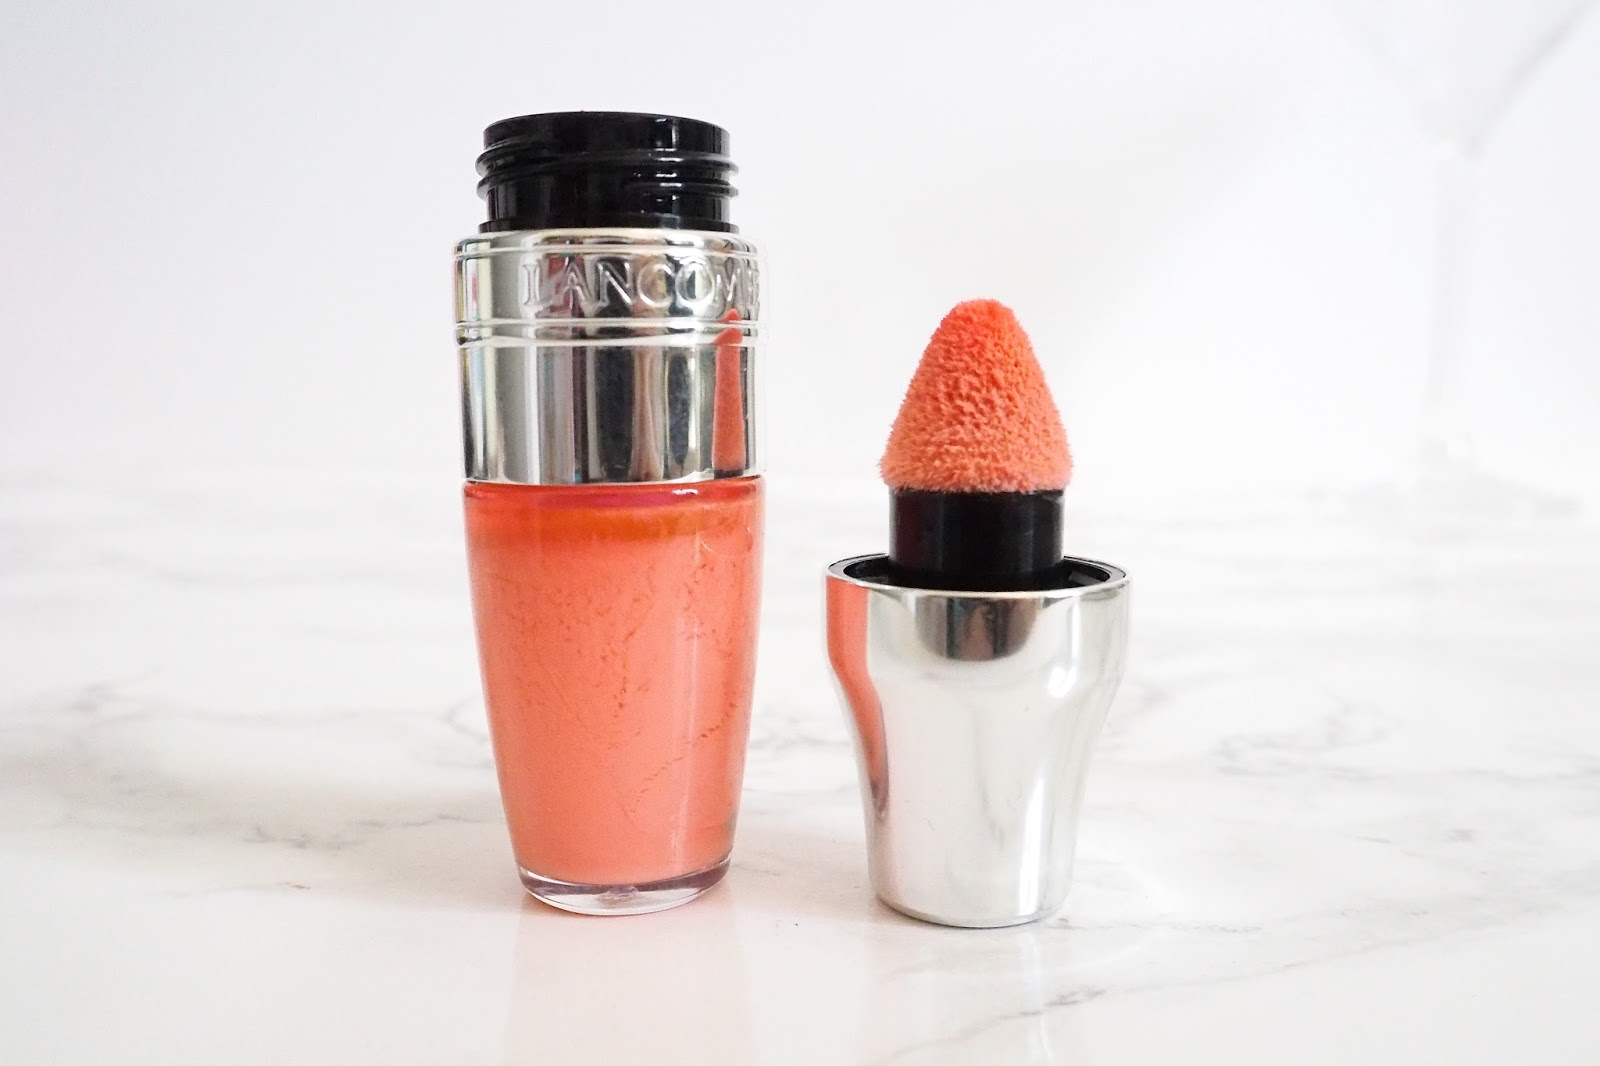 Lancome Juicy Shaker